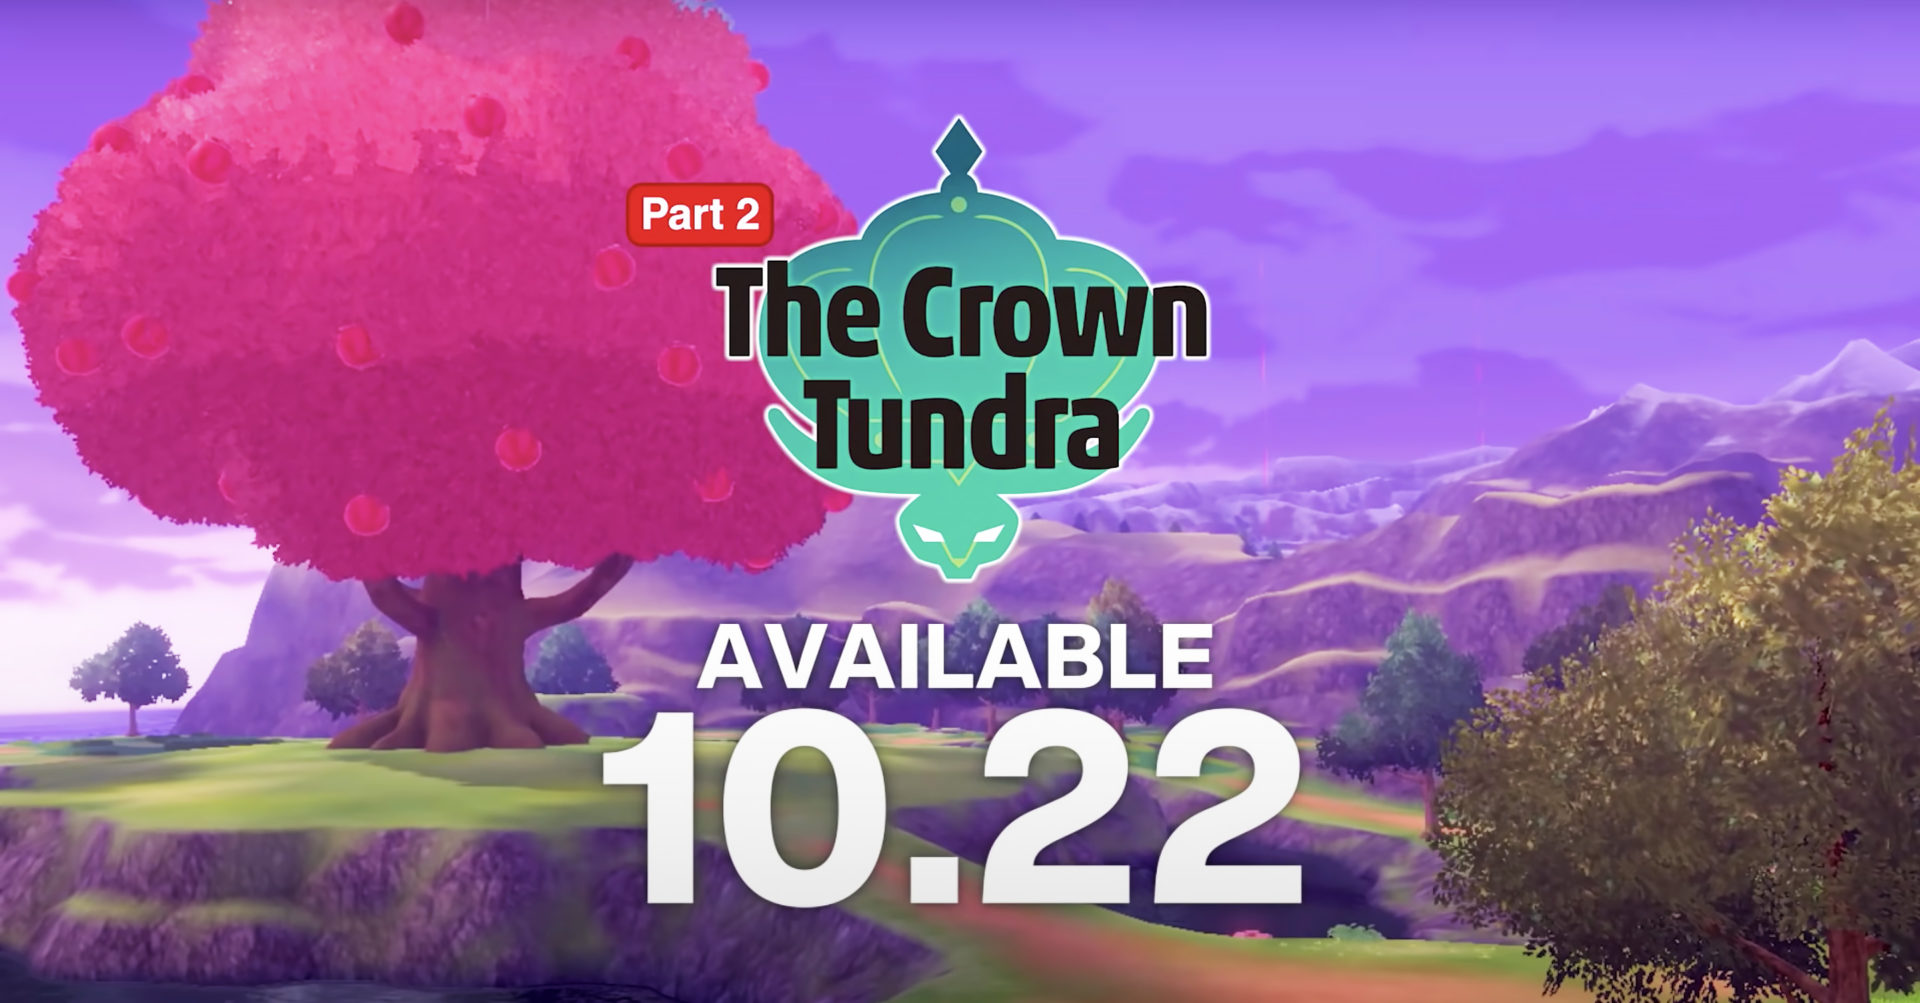 pokemon the crown tundra promo image